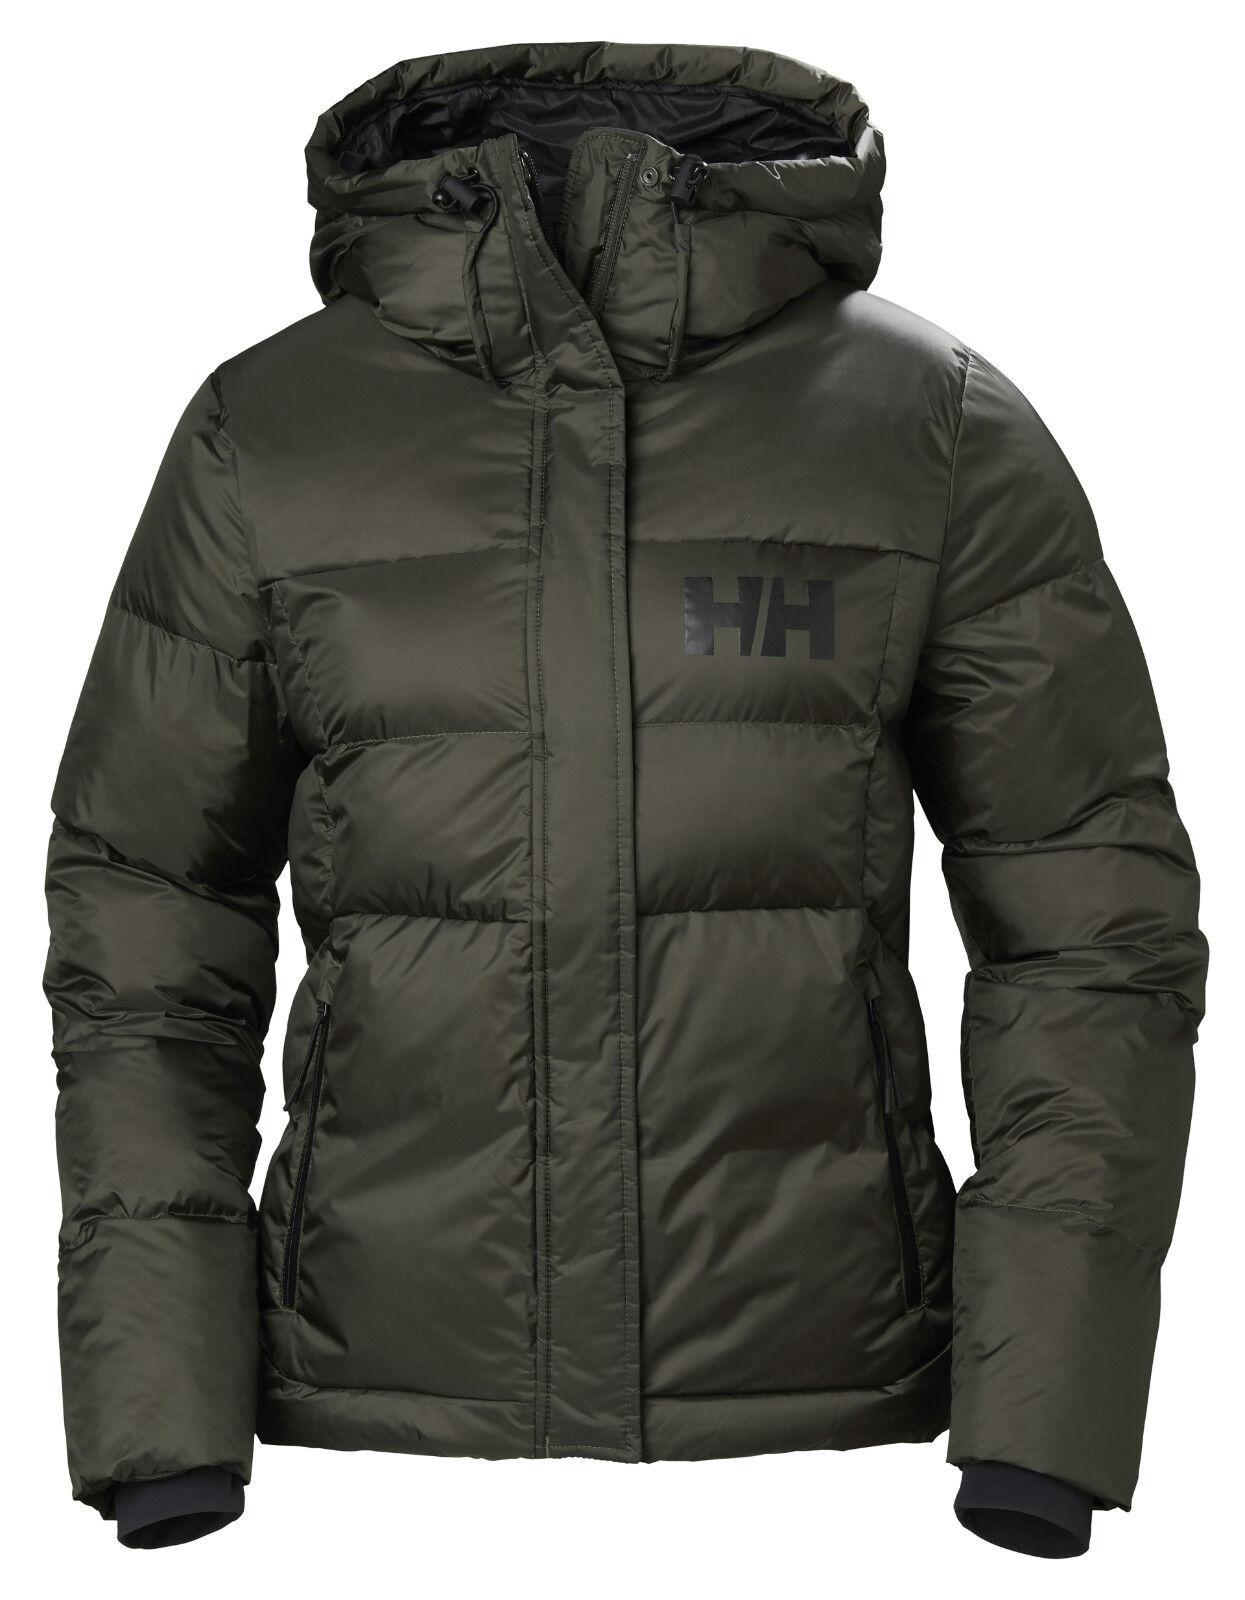 HH Helly Hansen Stellar Puffy Jacket women 53216 beluga Damenjacke Winterjacke